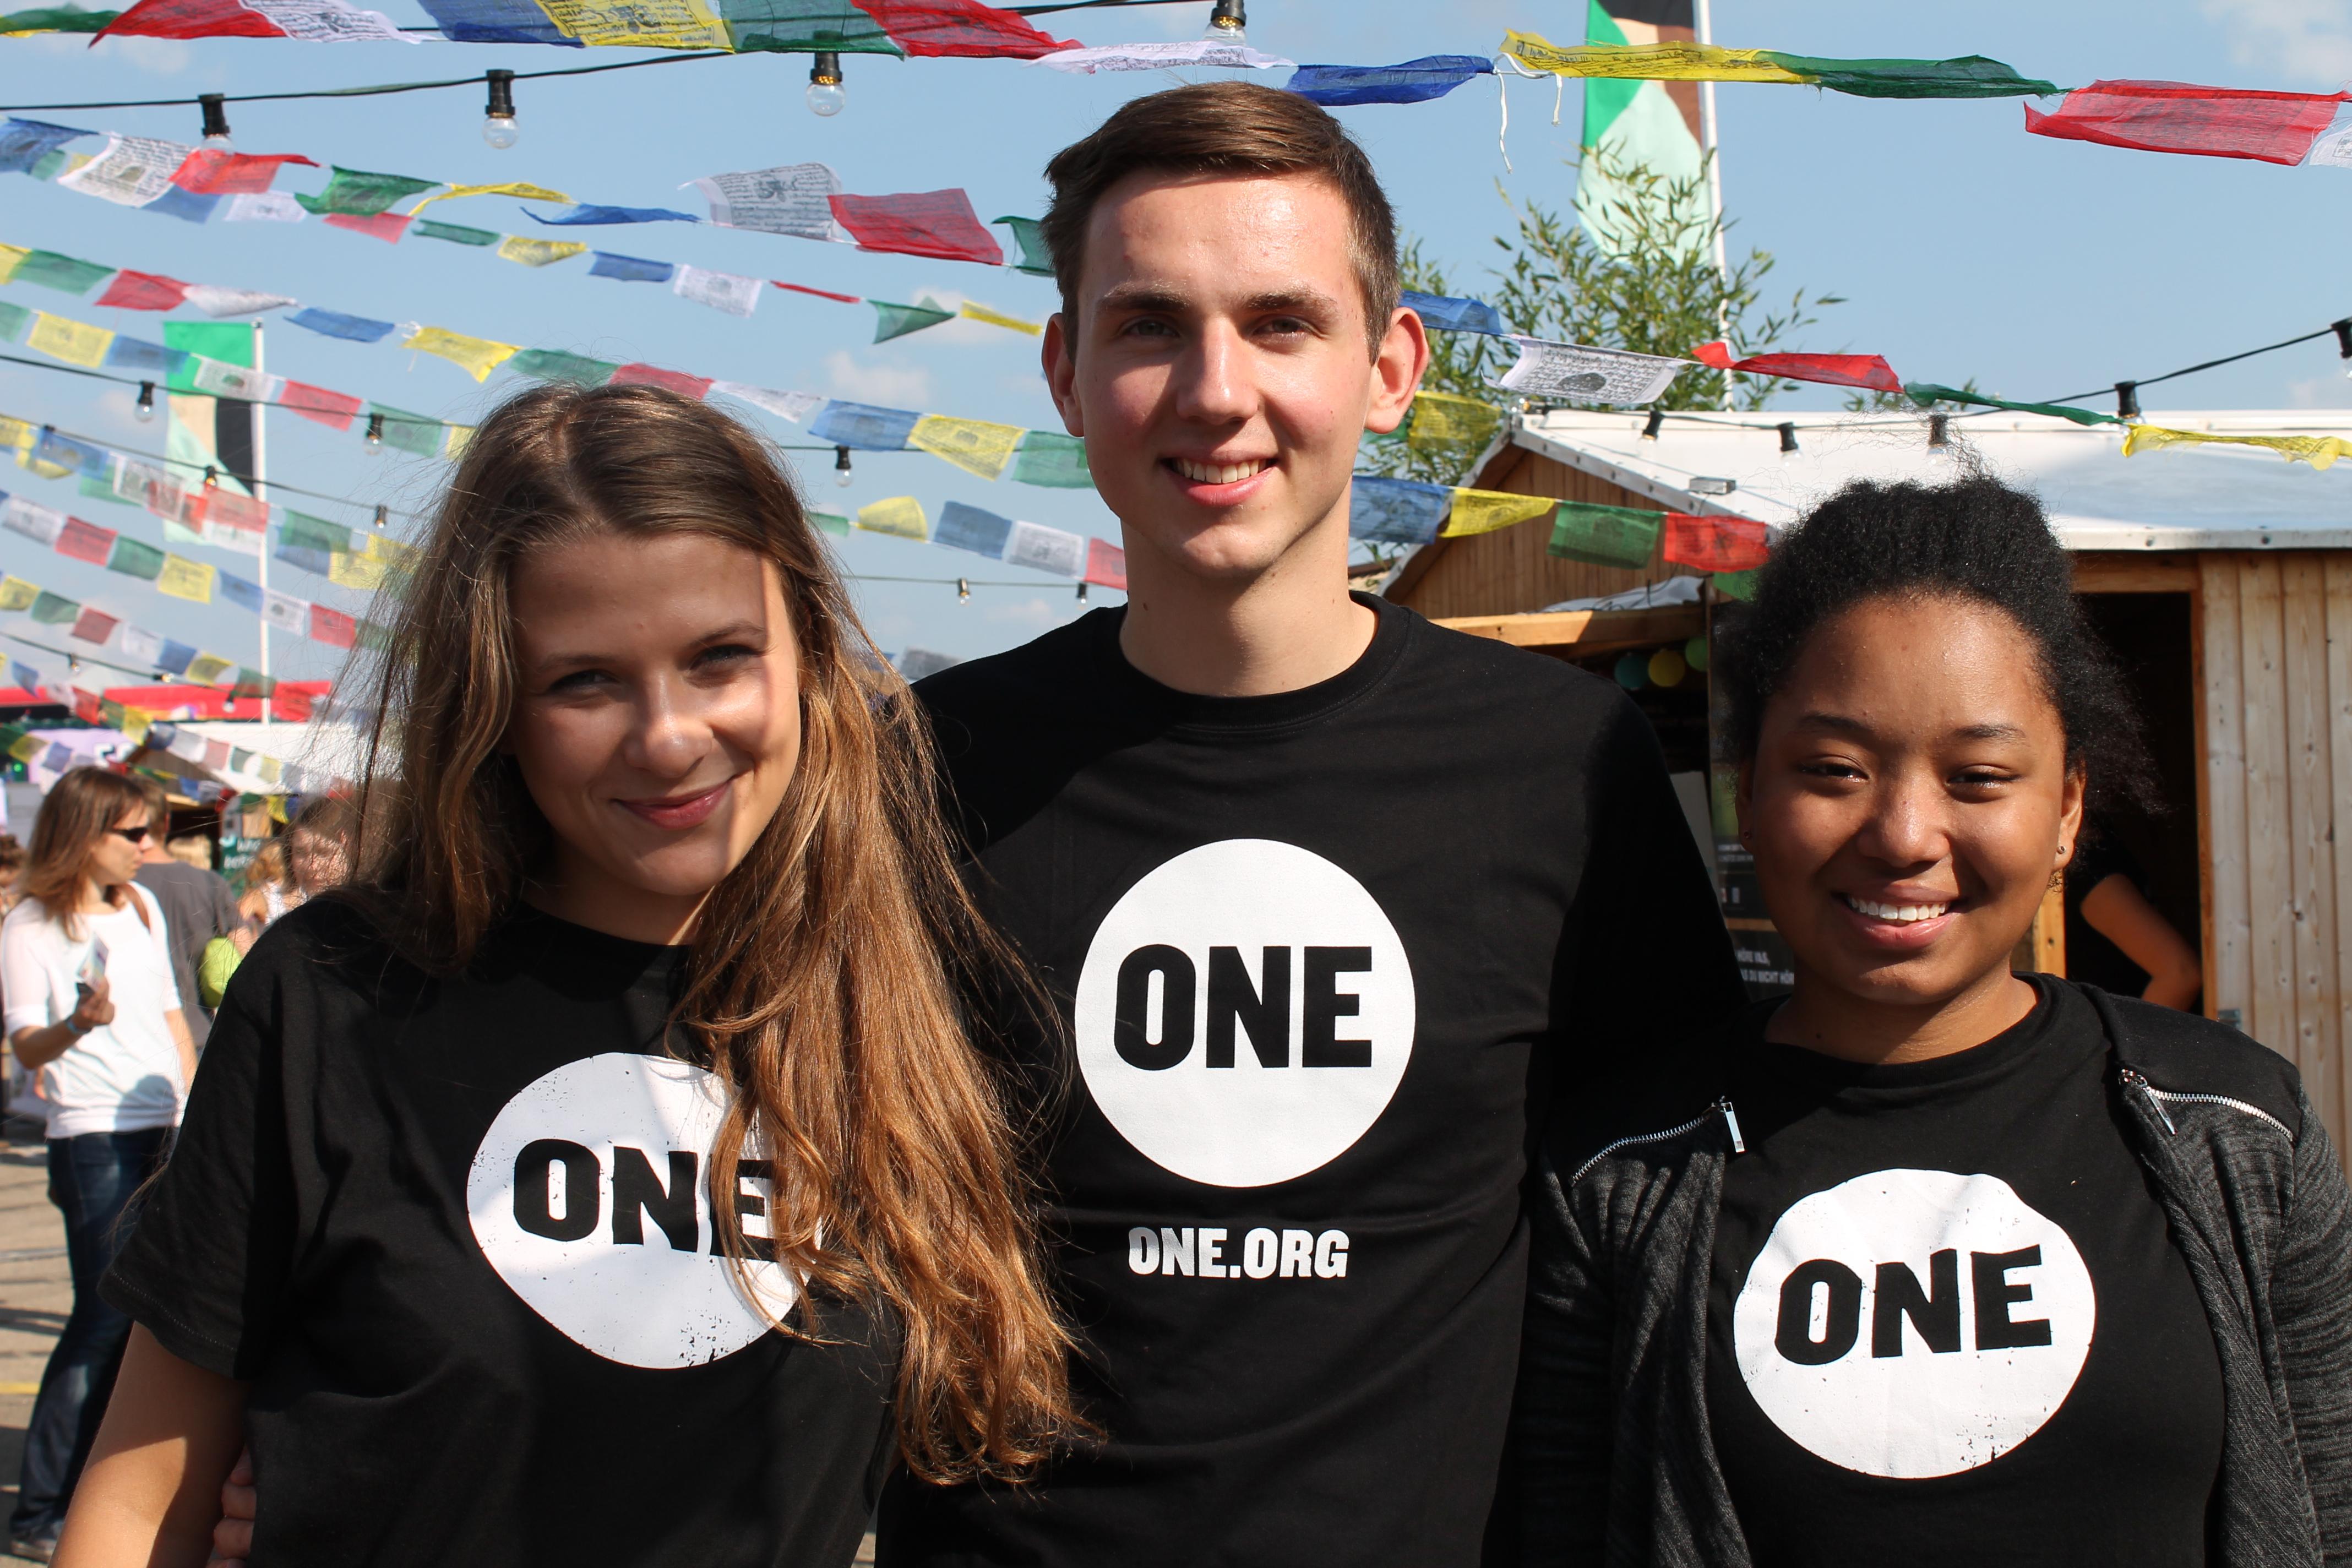 Mit ONE auf dem Lollapalooza: Peace, Love, Music und Strengthies